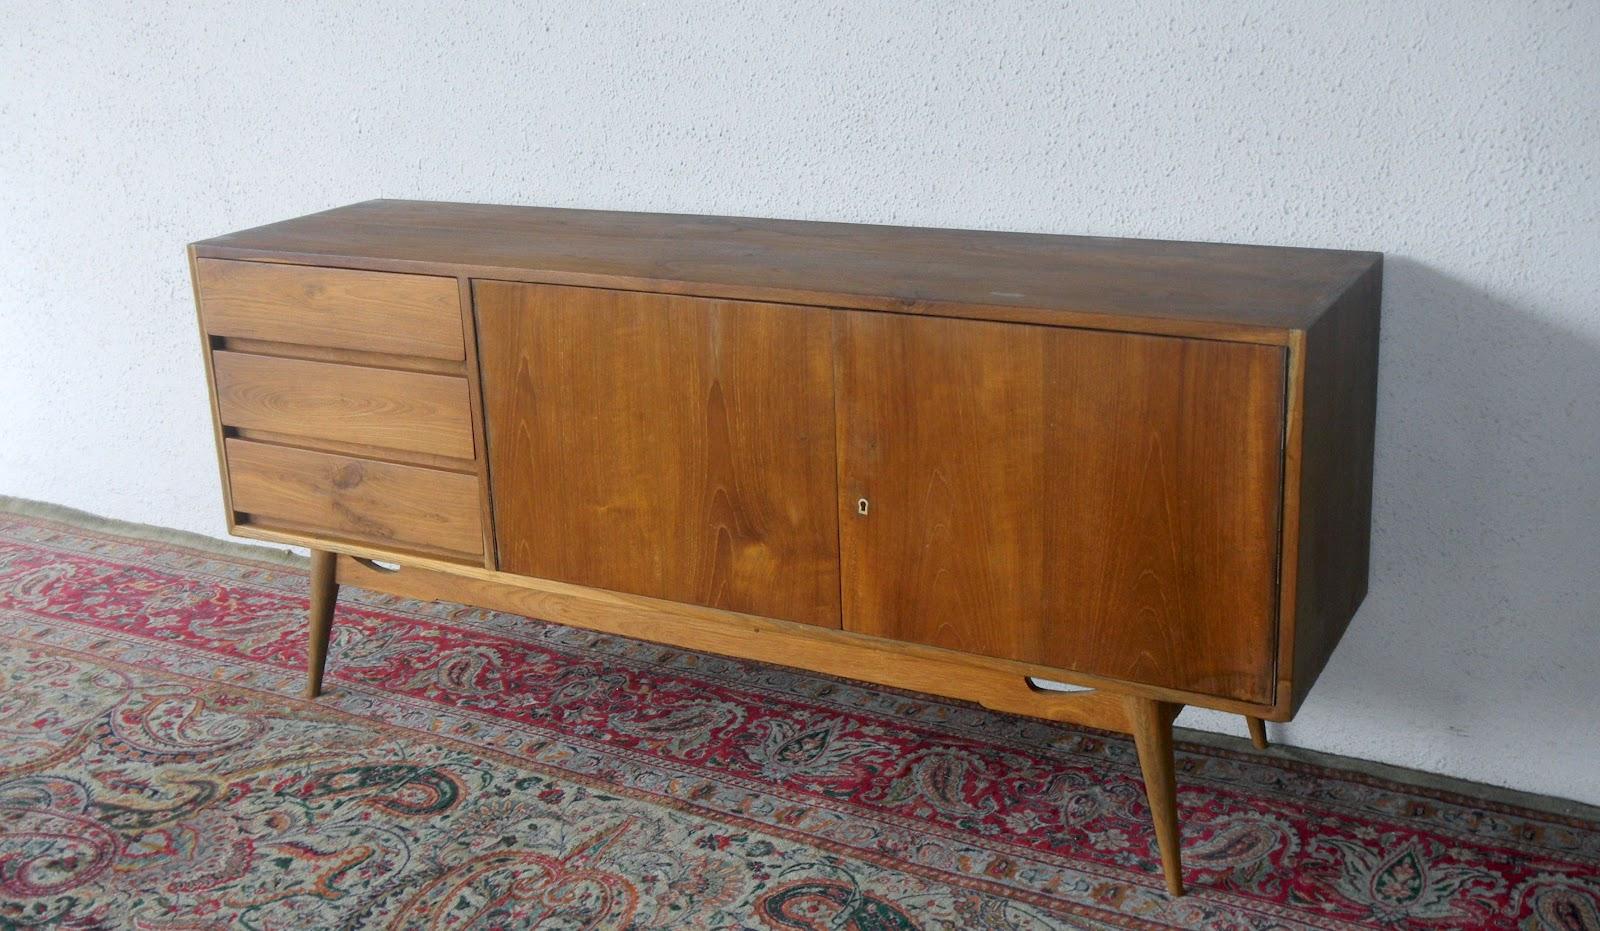 Vintage Furniture Beautiful Sideboards Wardrobes And